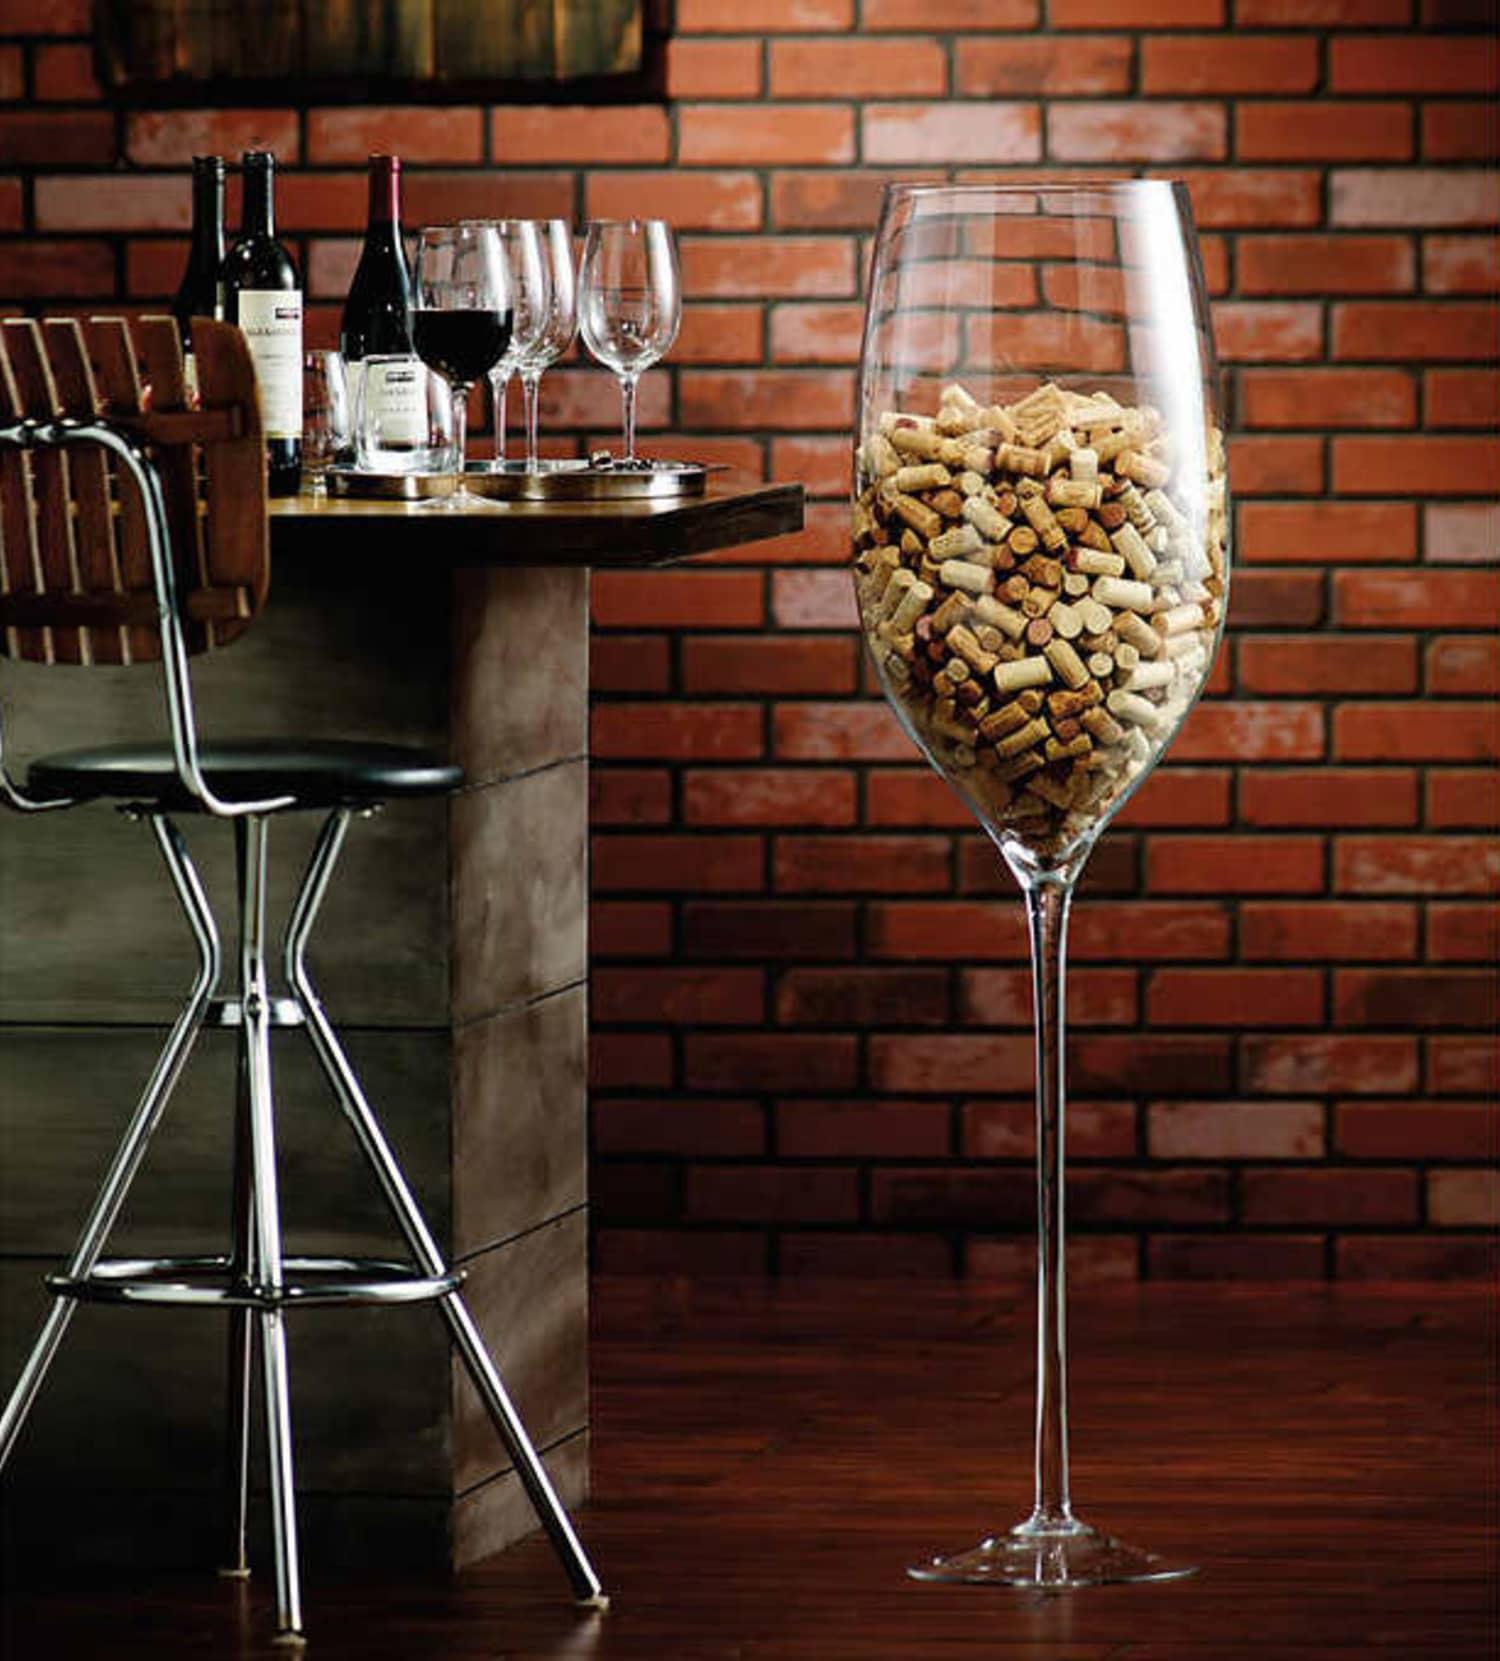 Costco Amazon Oversized Wine Glass Decor